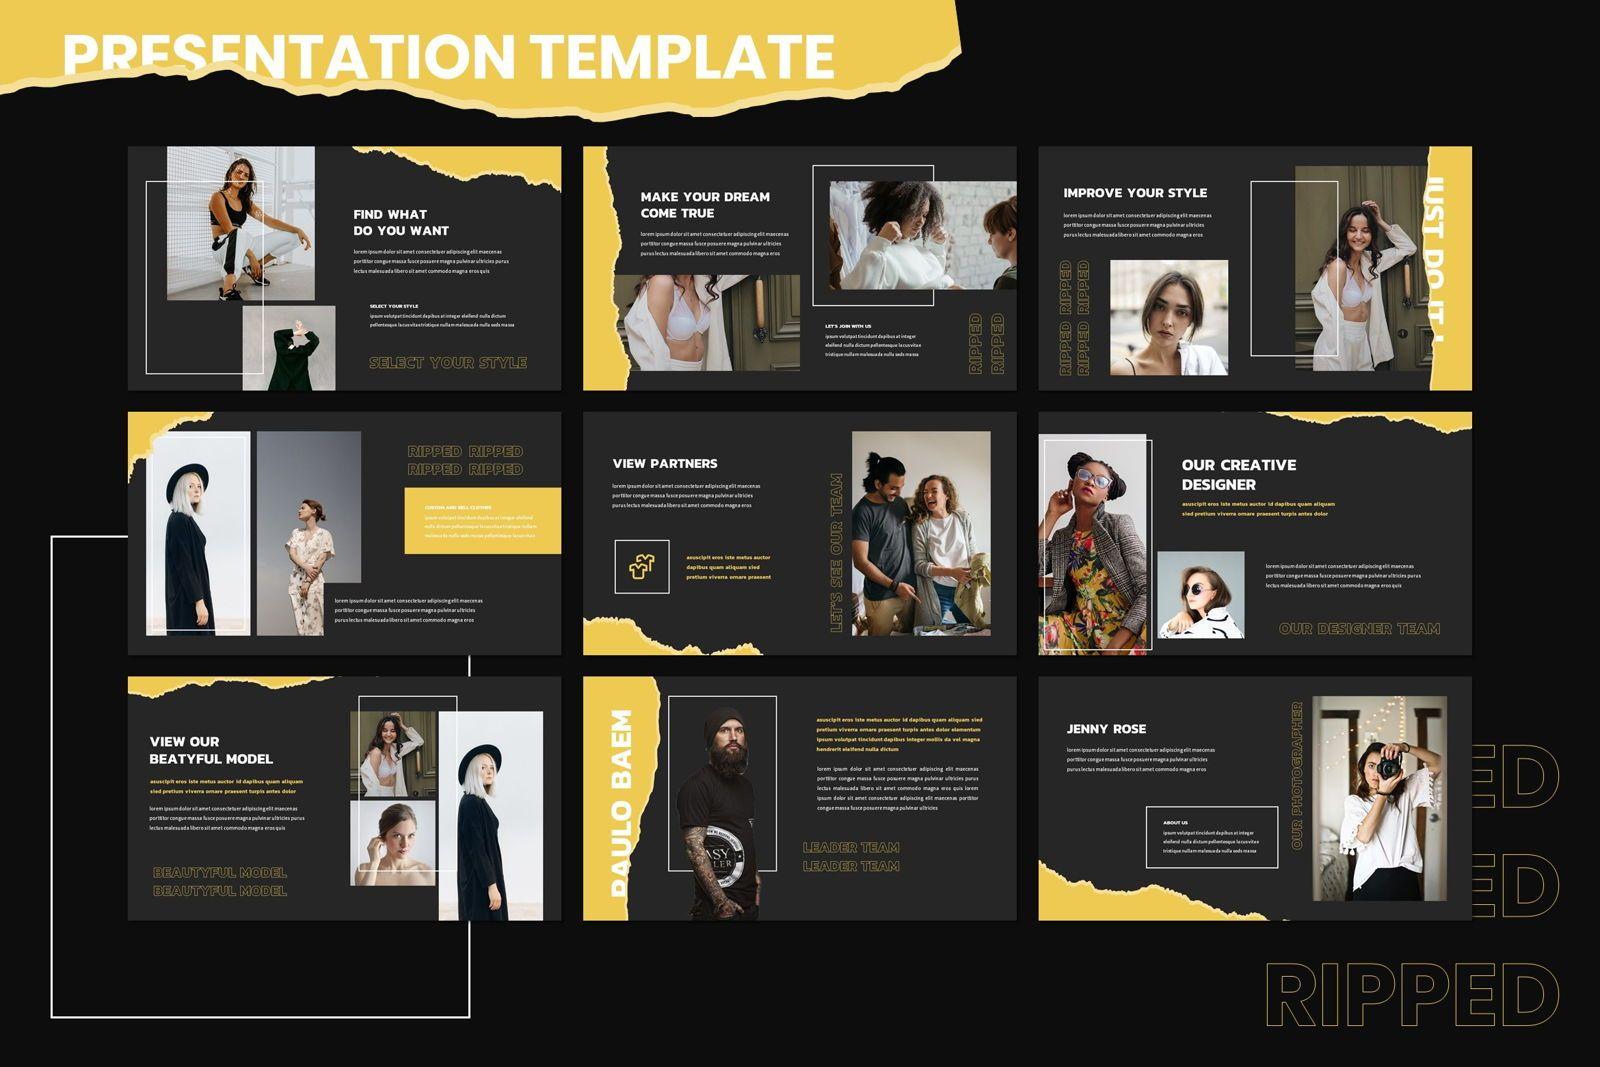 Riped - Google Slides Template, Slide 3, 08011, Presentation Templates — PoweredTemplate.com